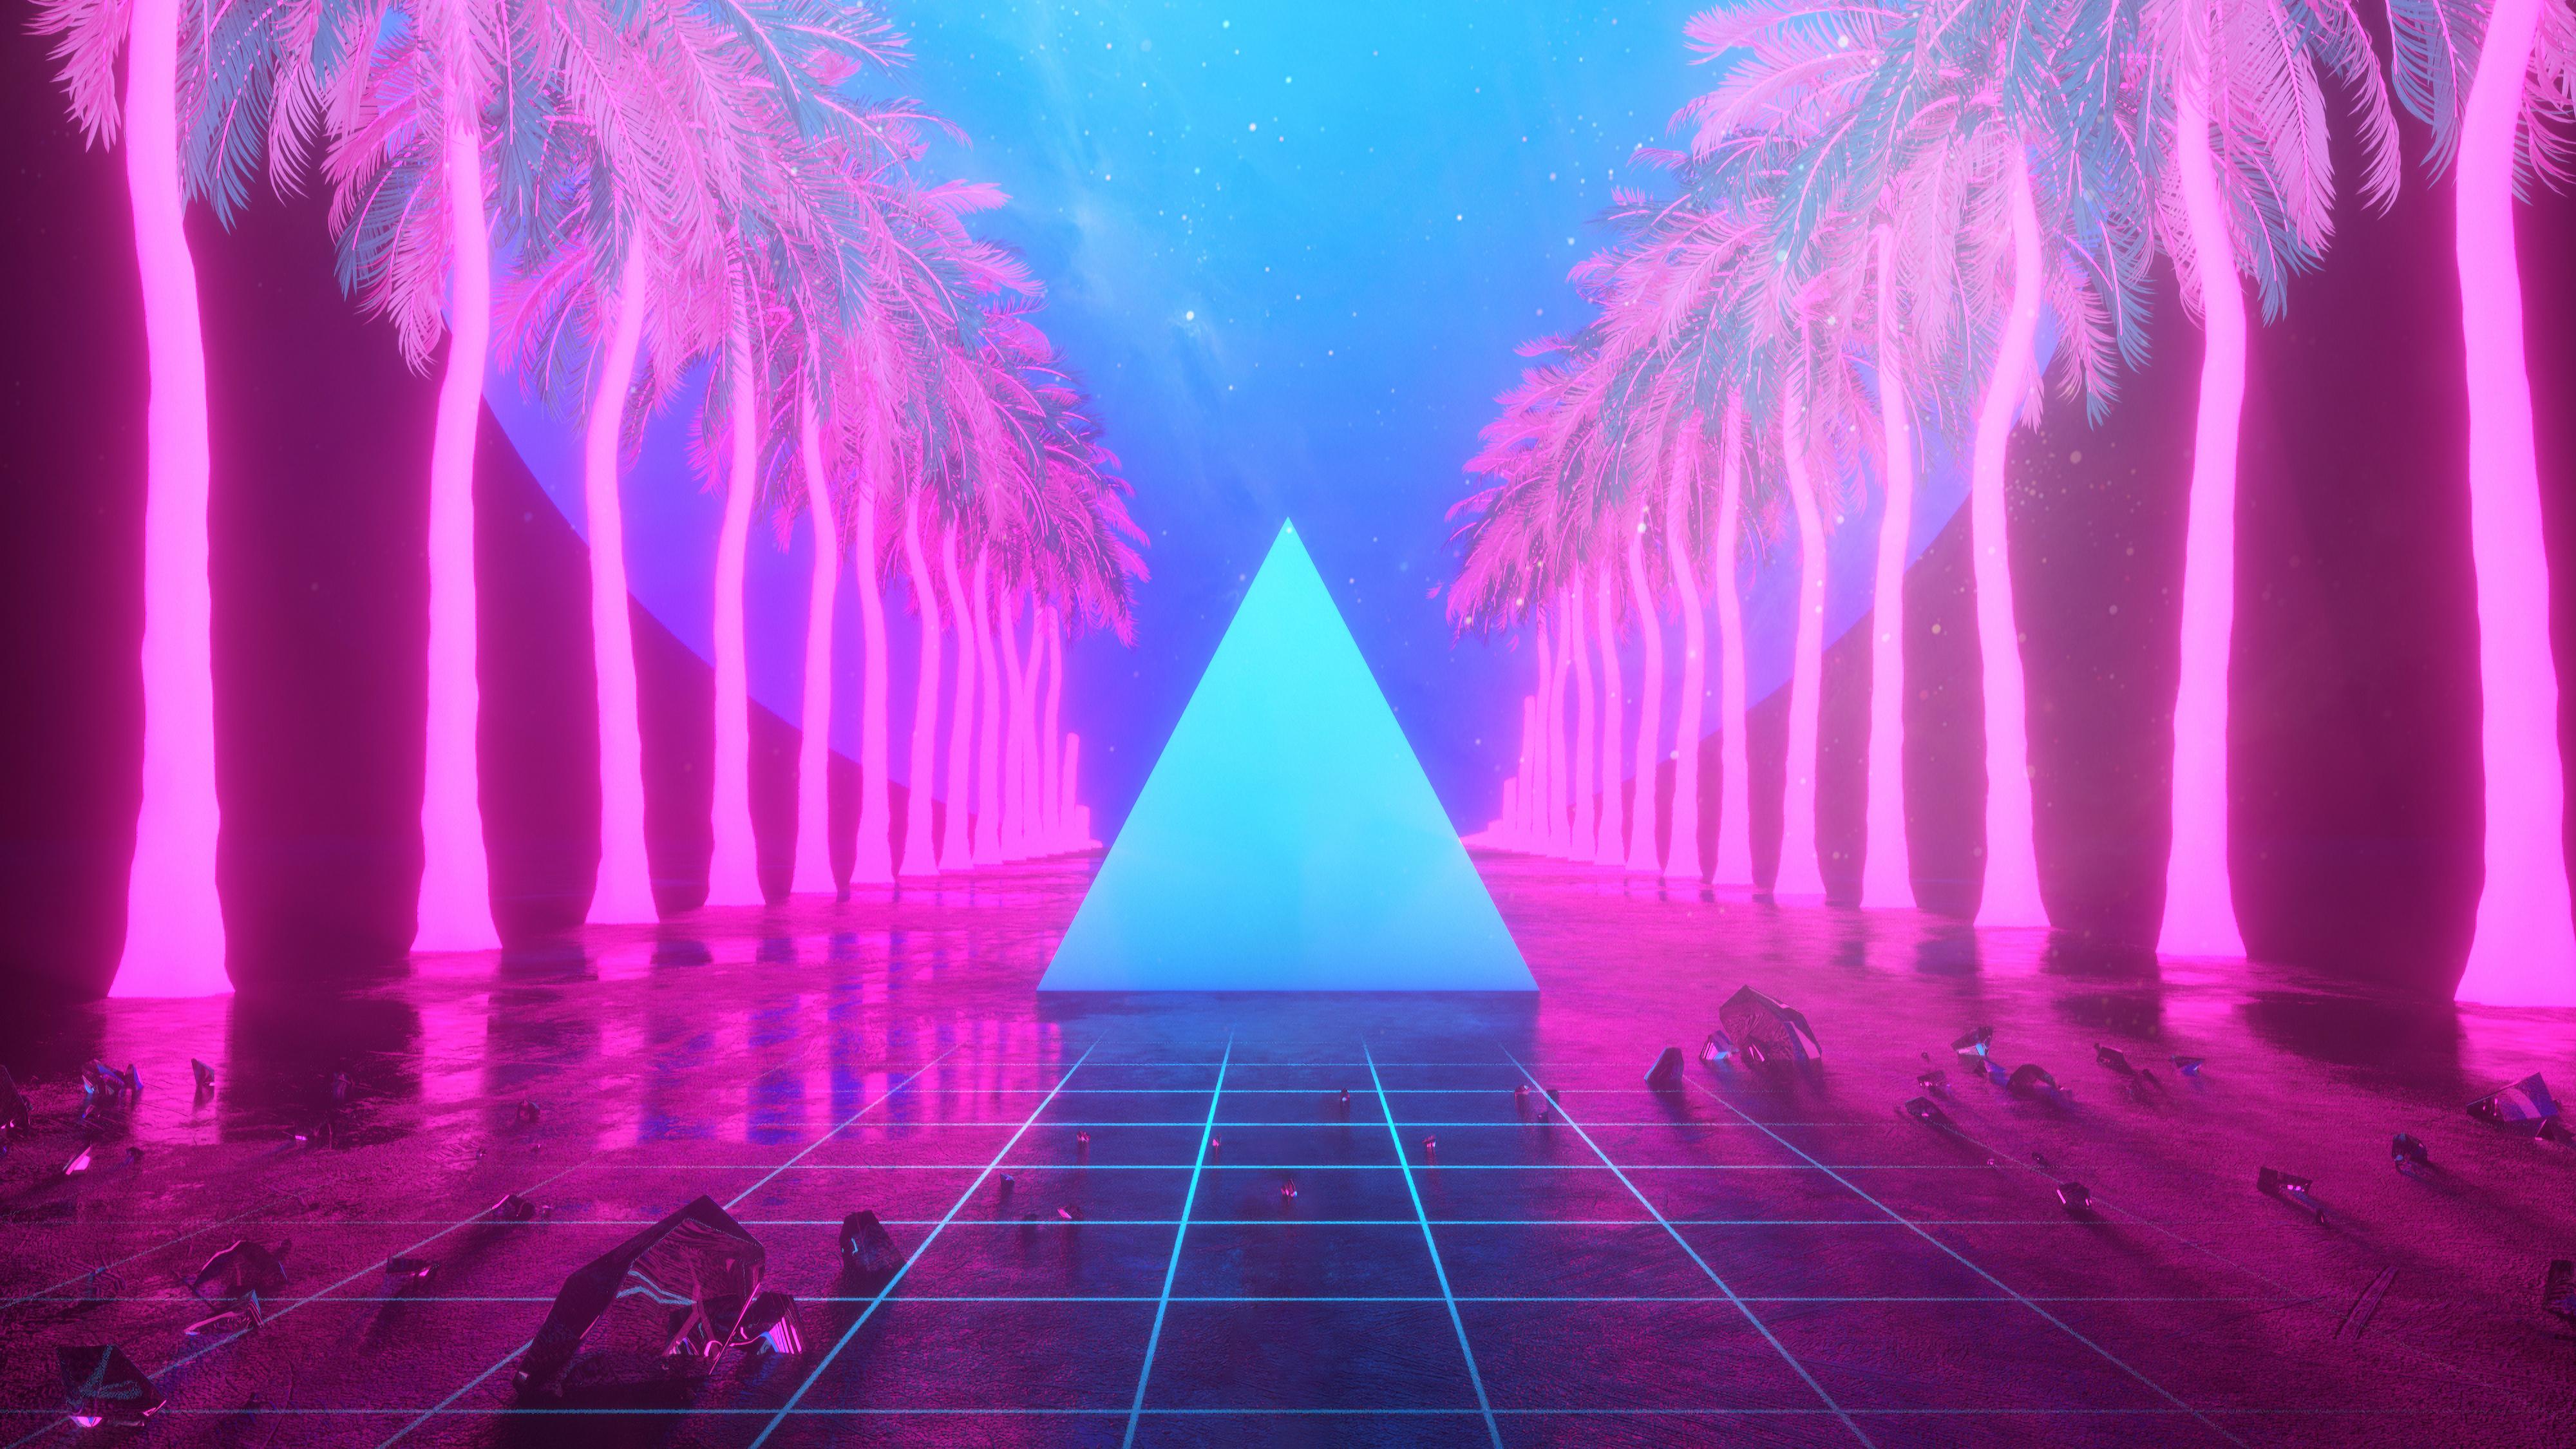 Miami Trees Triangle Neon Artwork 4k